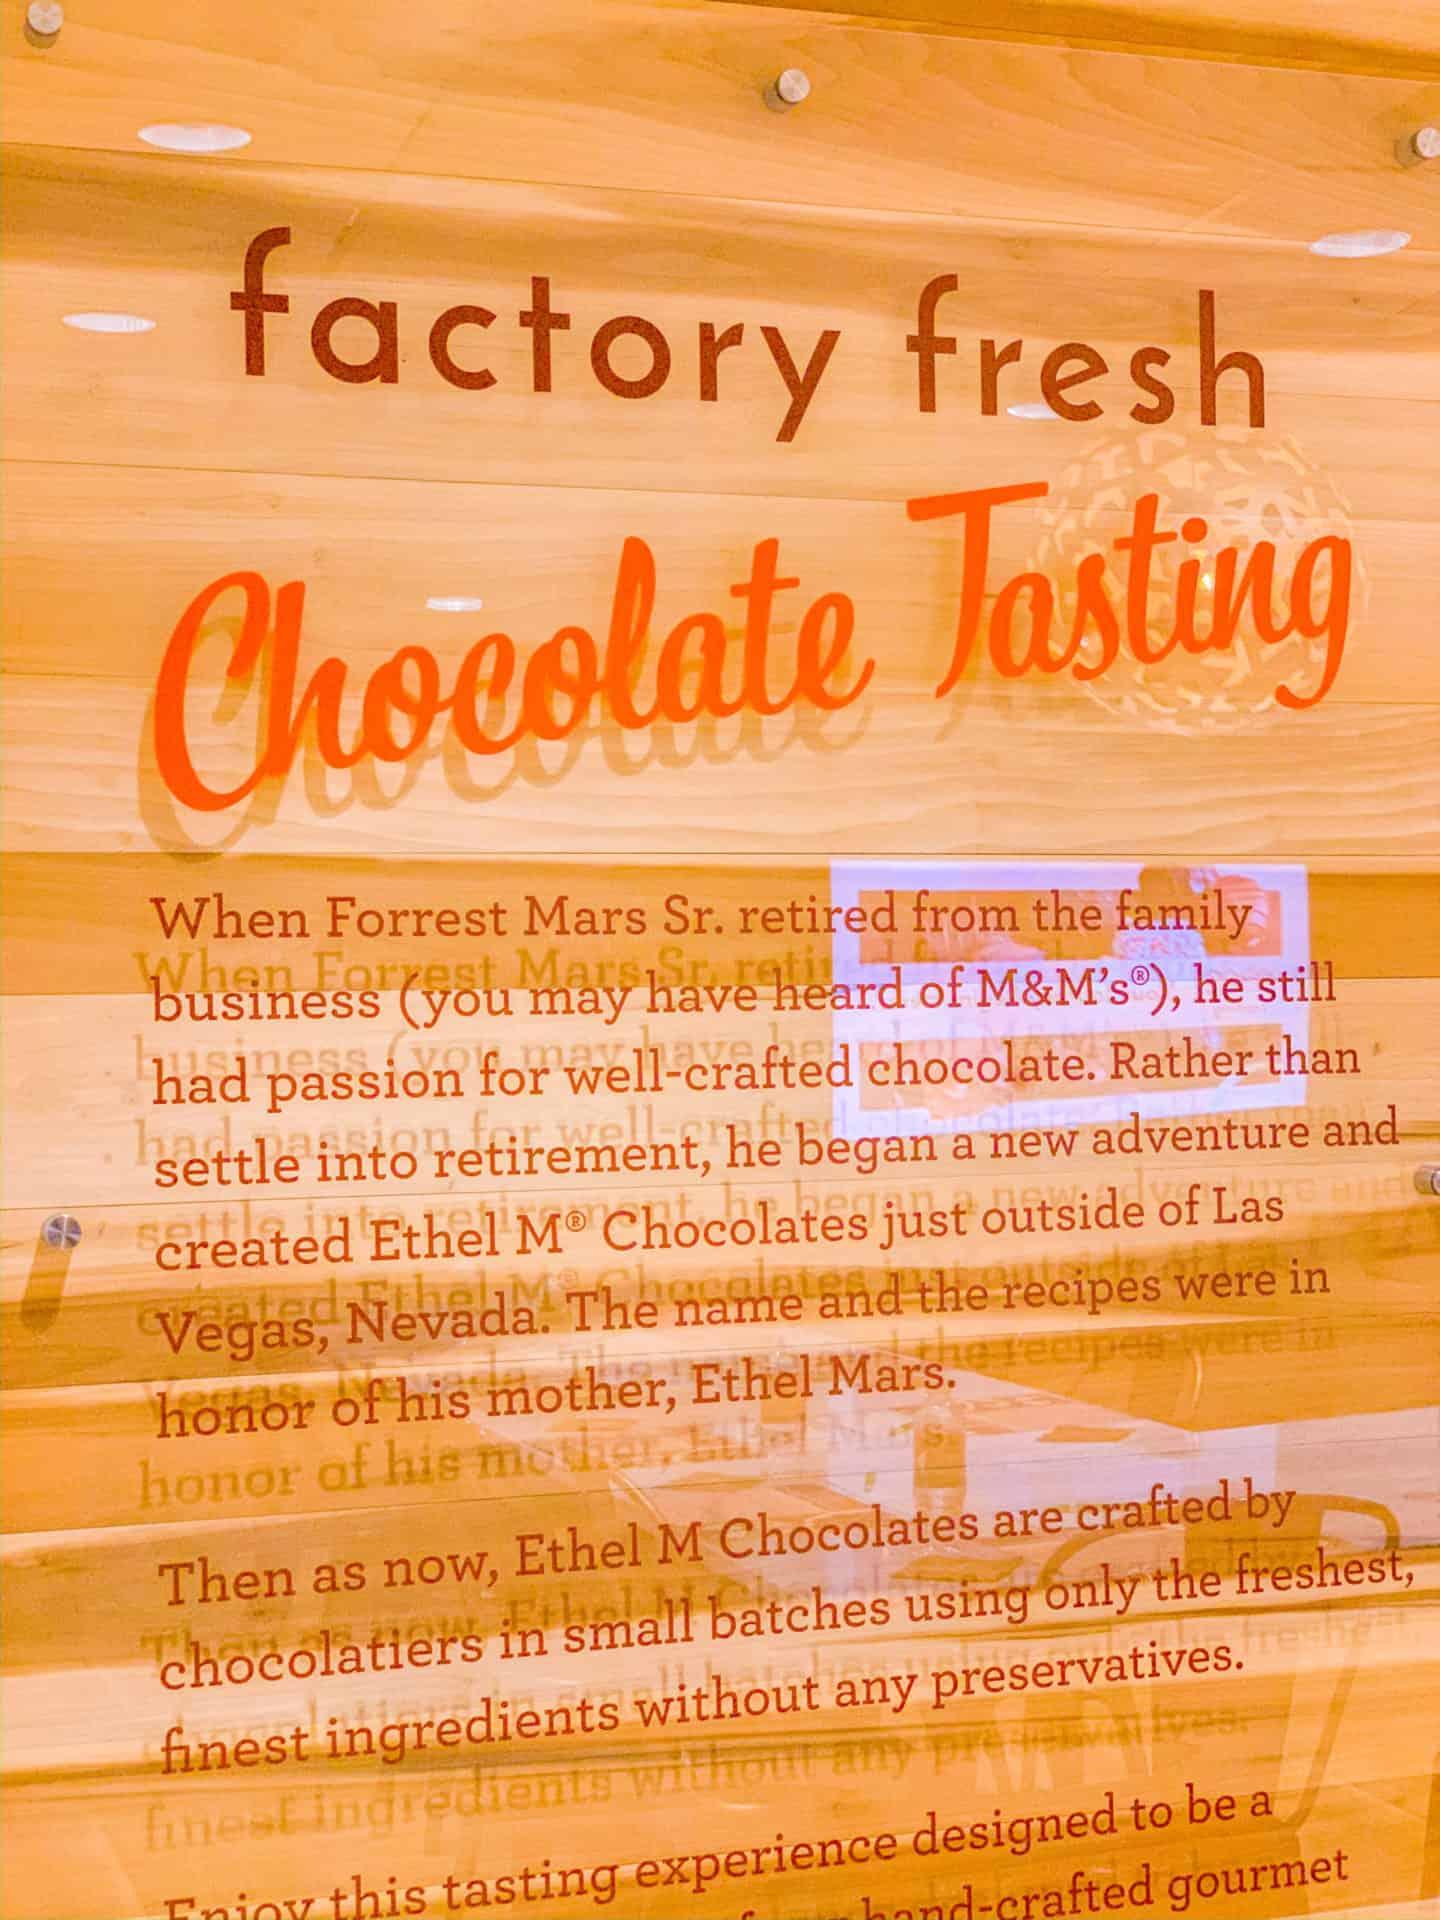 Las Vegas Factory Fresh Chocolate Tasting Experience